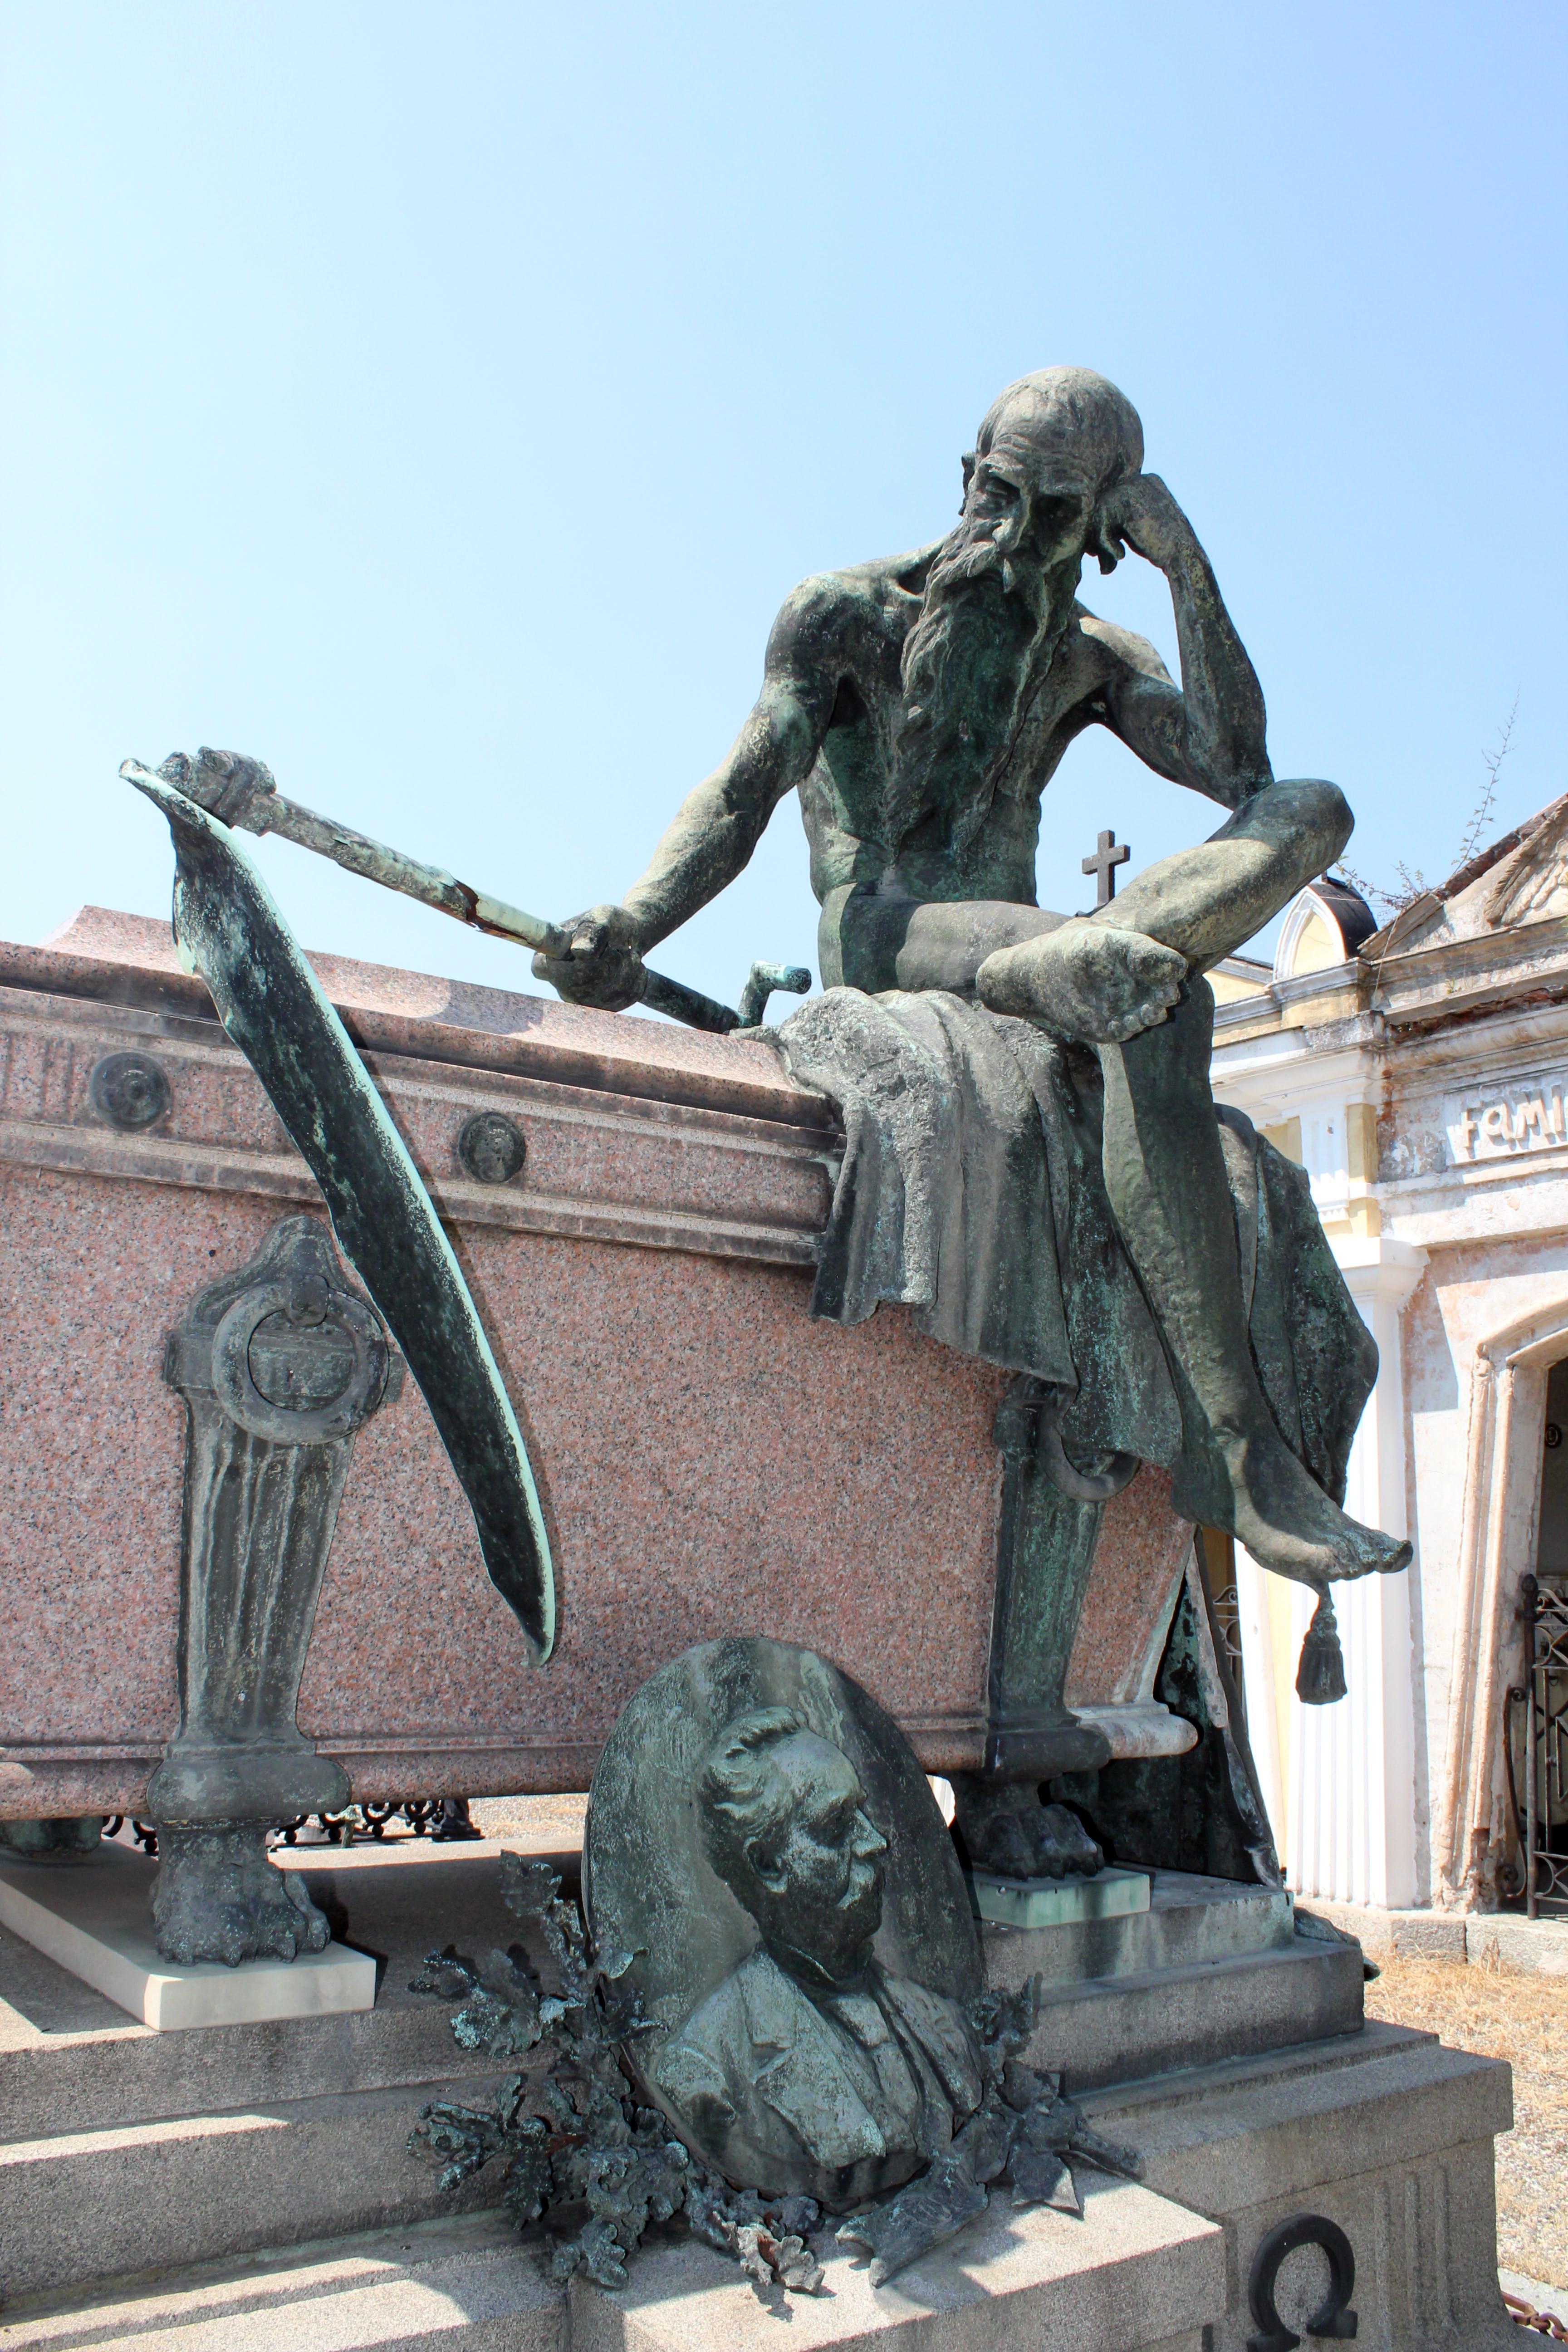 of cemetery, statue